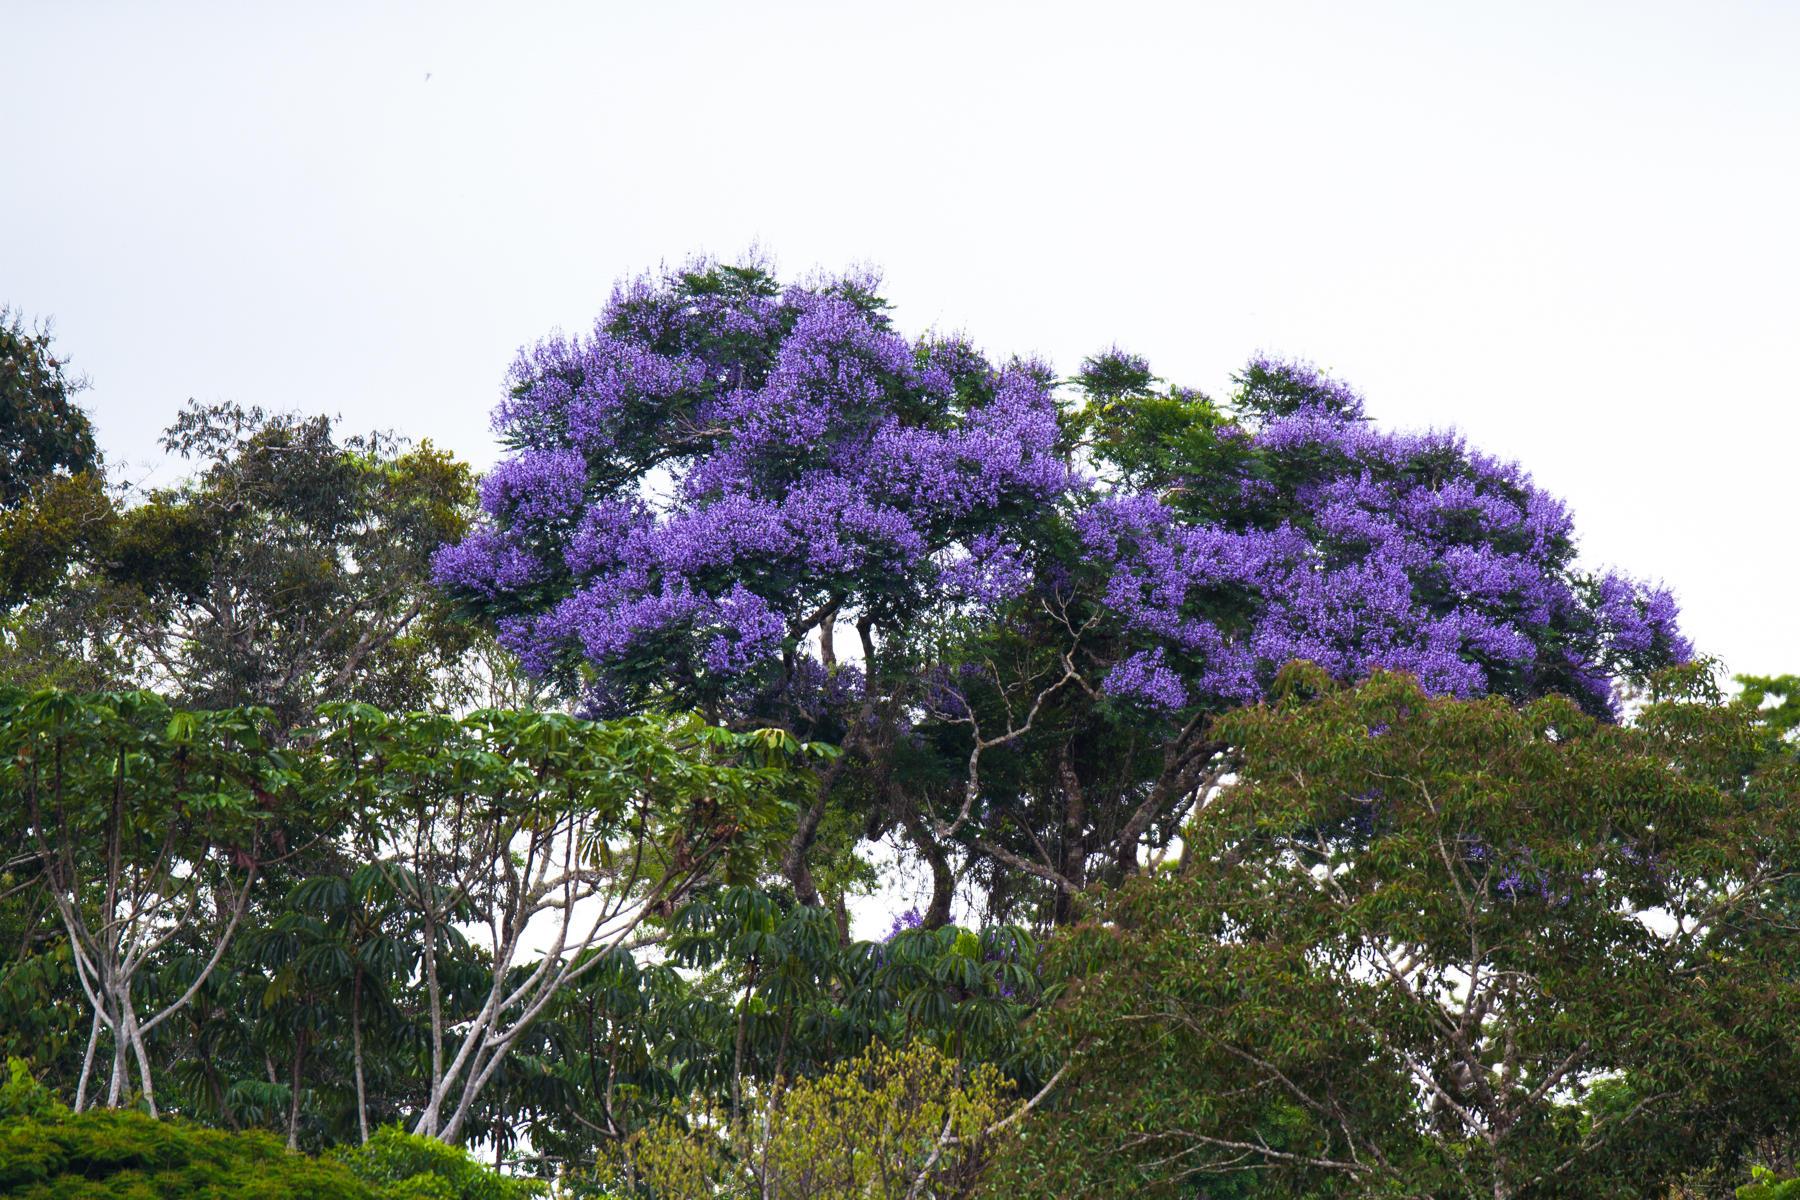 Canopy flower (Jacaranda) in rainforest